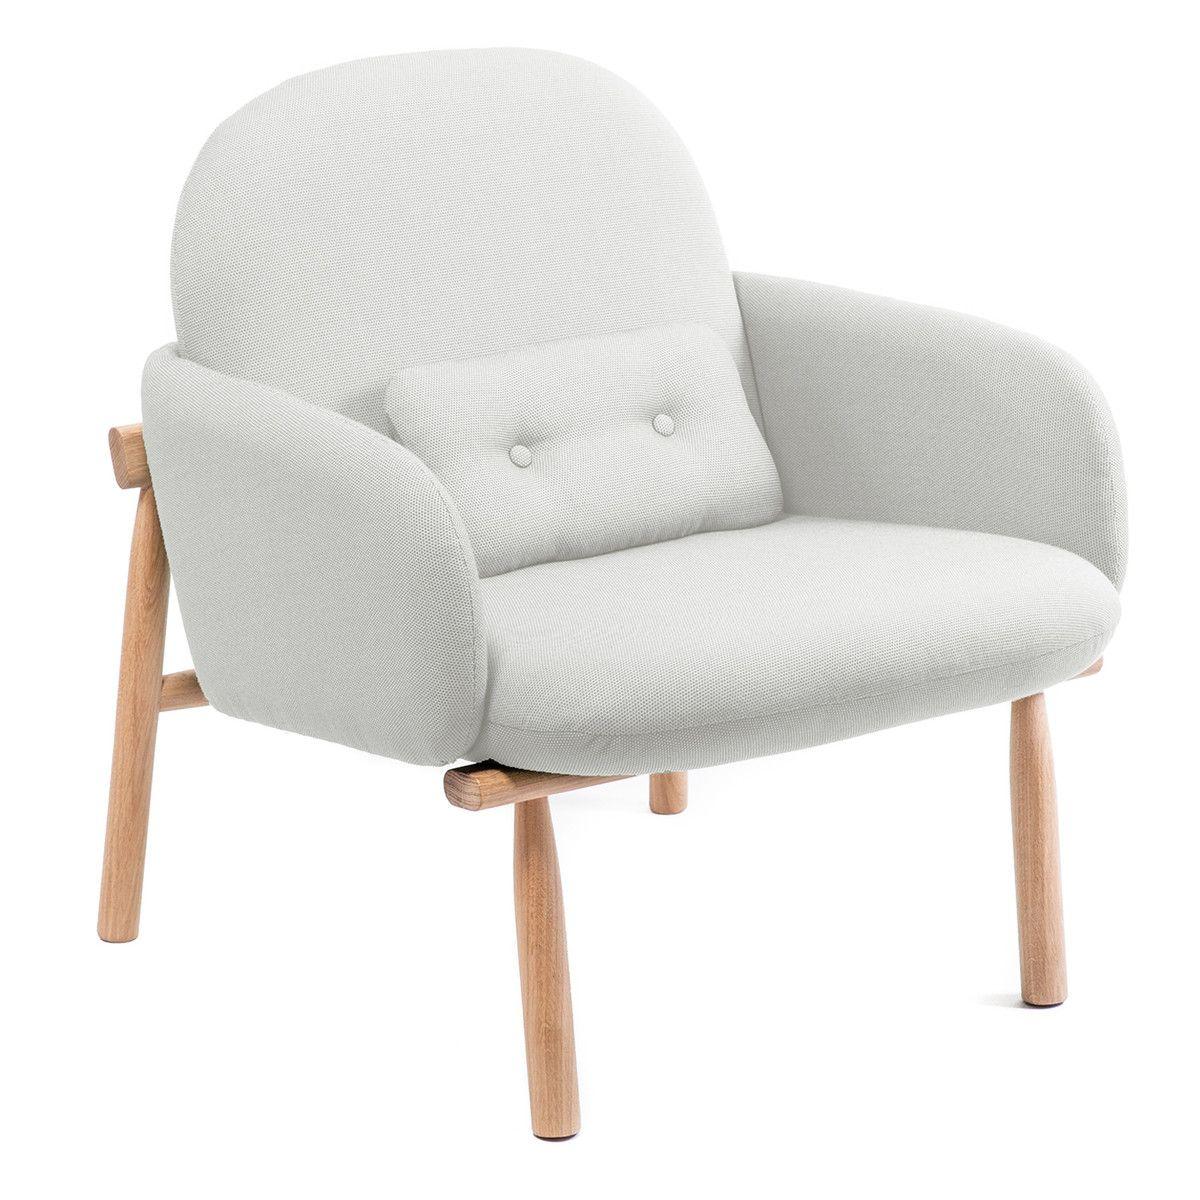 hart georges sessel hellgrau swing 51807 hellgrau t. Black Bedroom Furniture Sets. Home Design Ideas